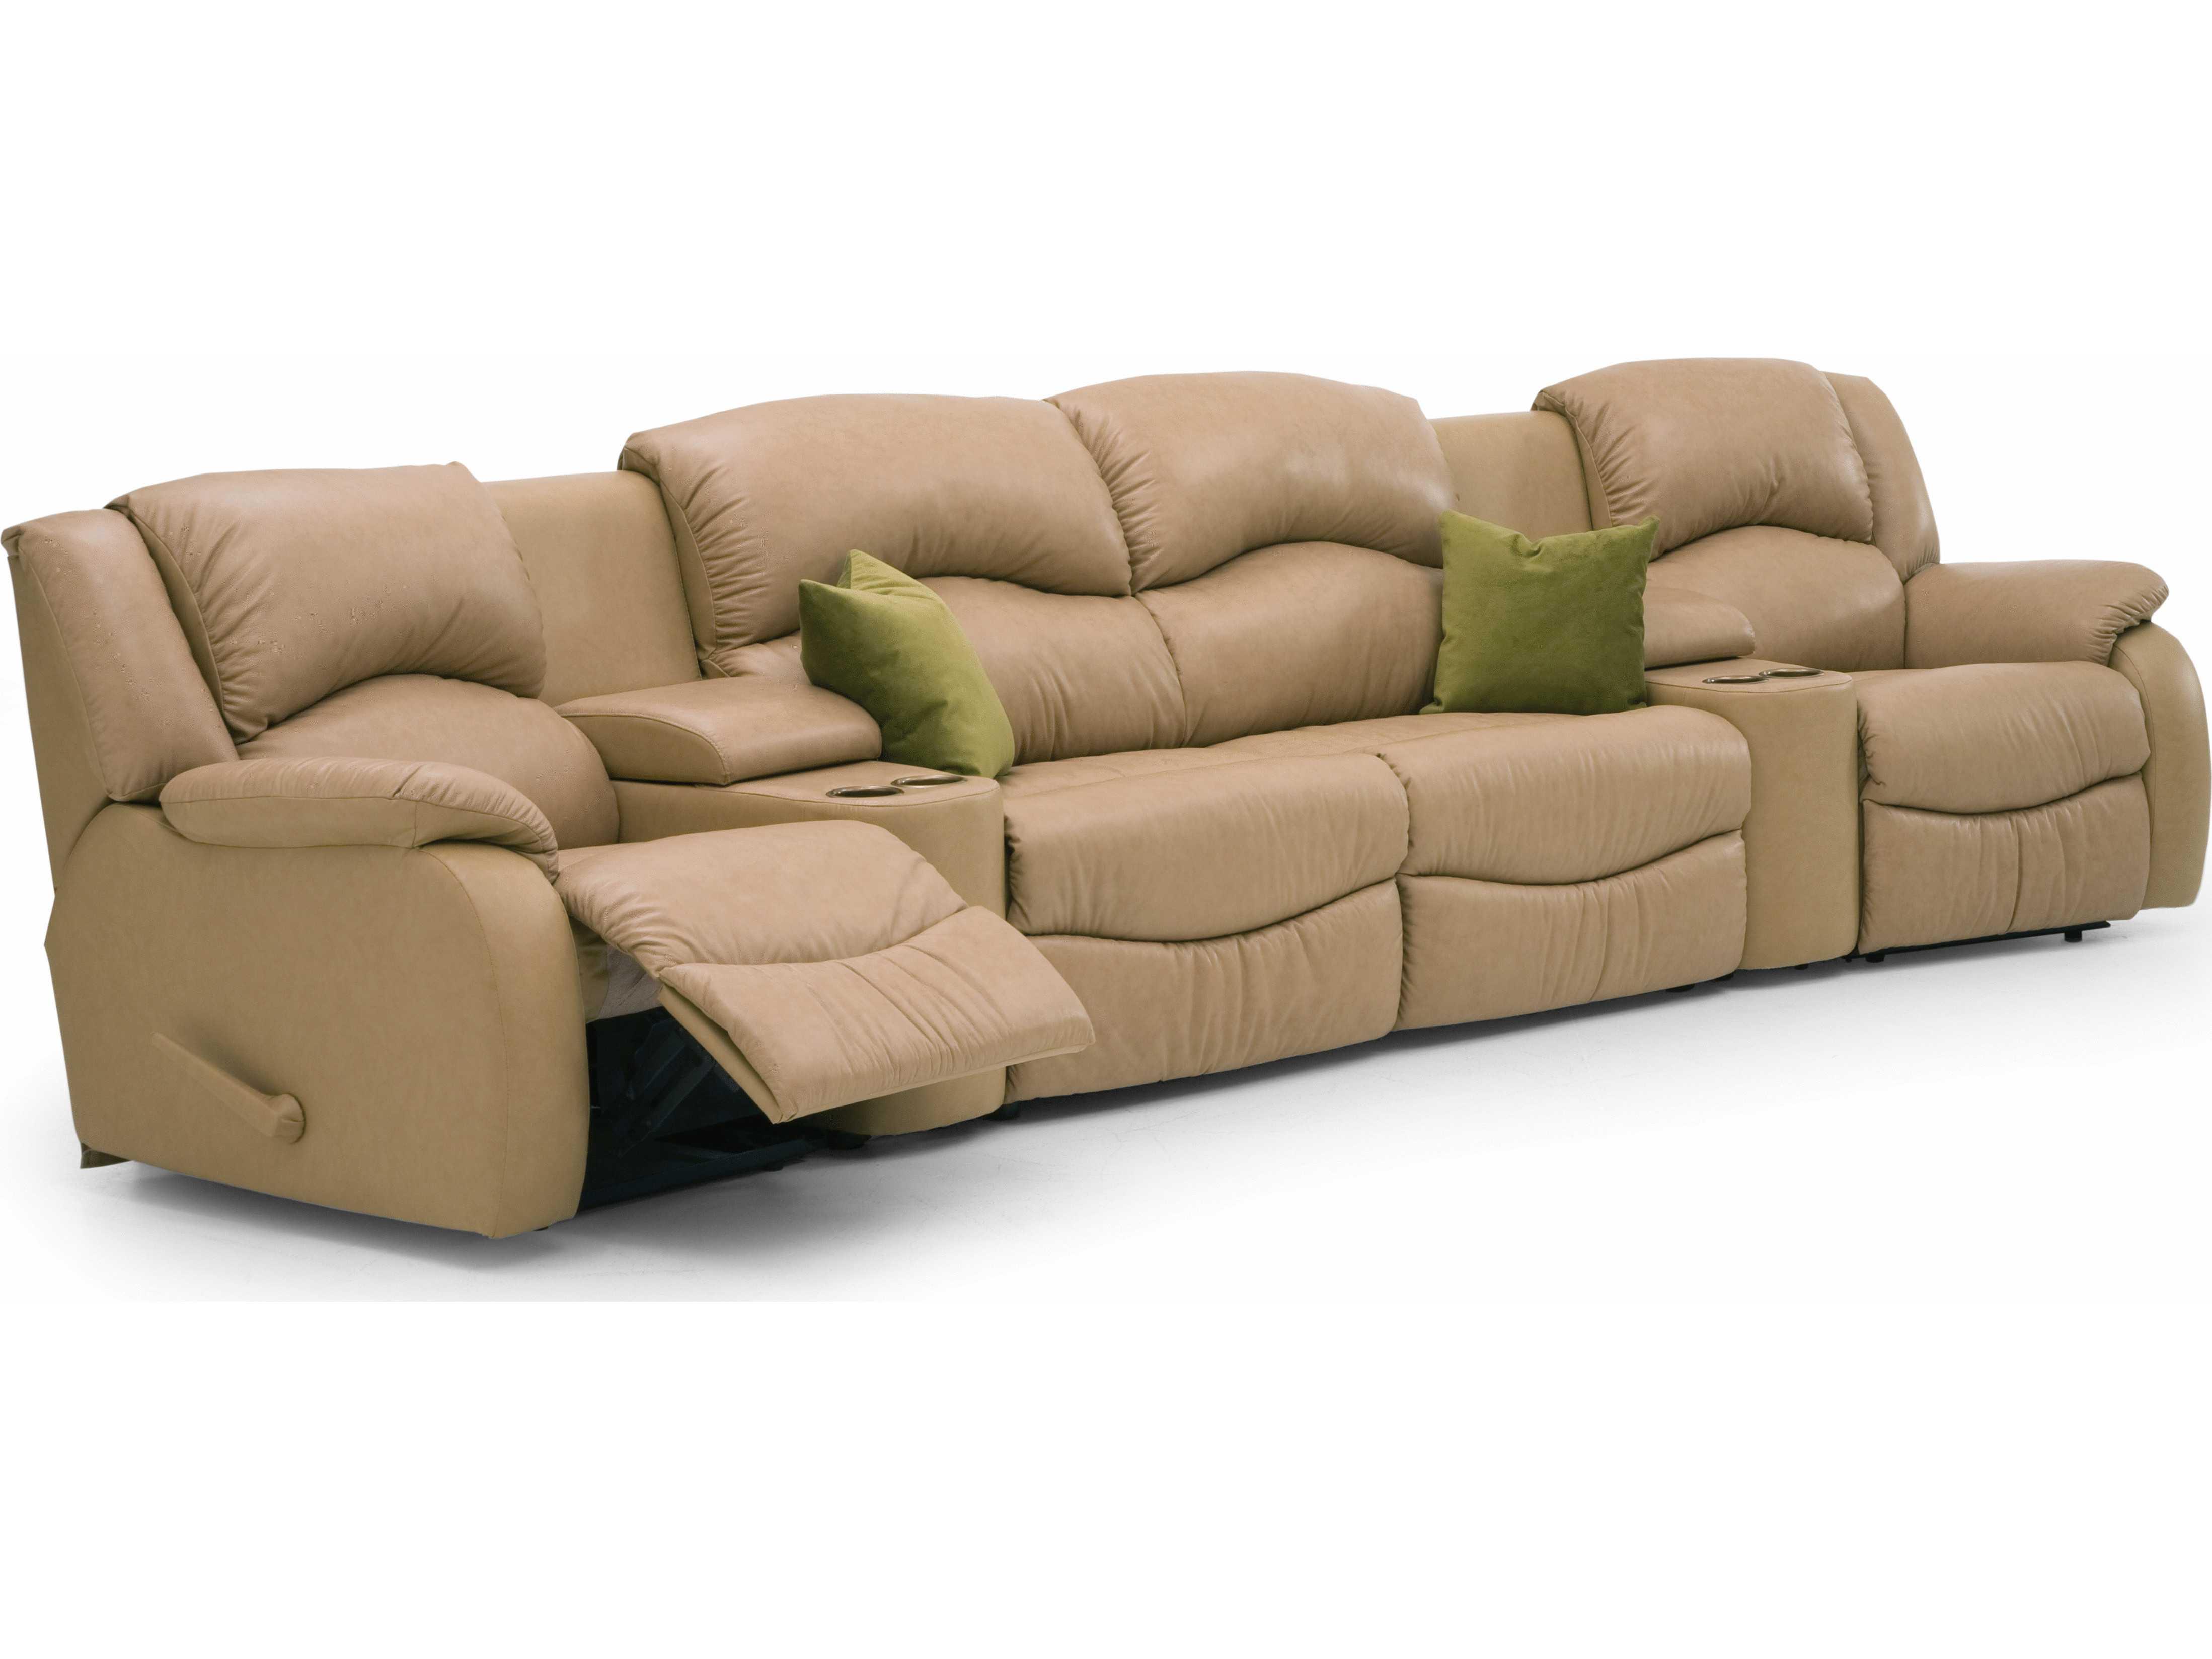 Palliser Dane Motion Sectional With Sofa Bed Sofa